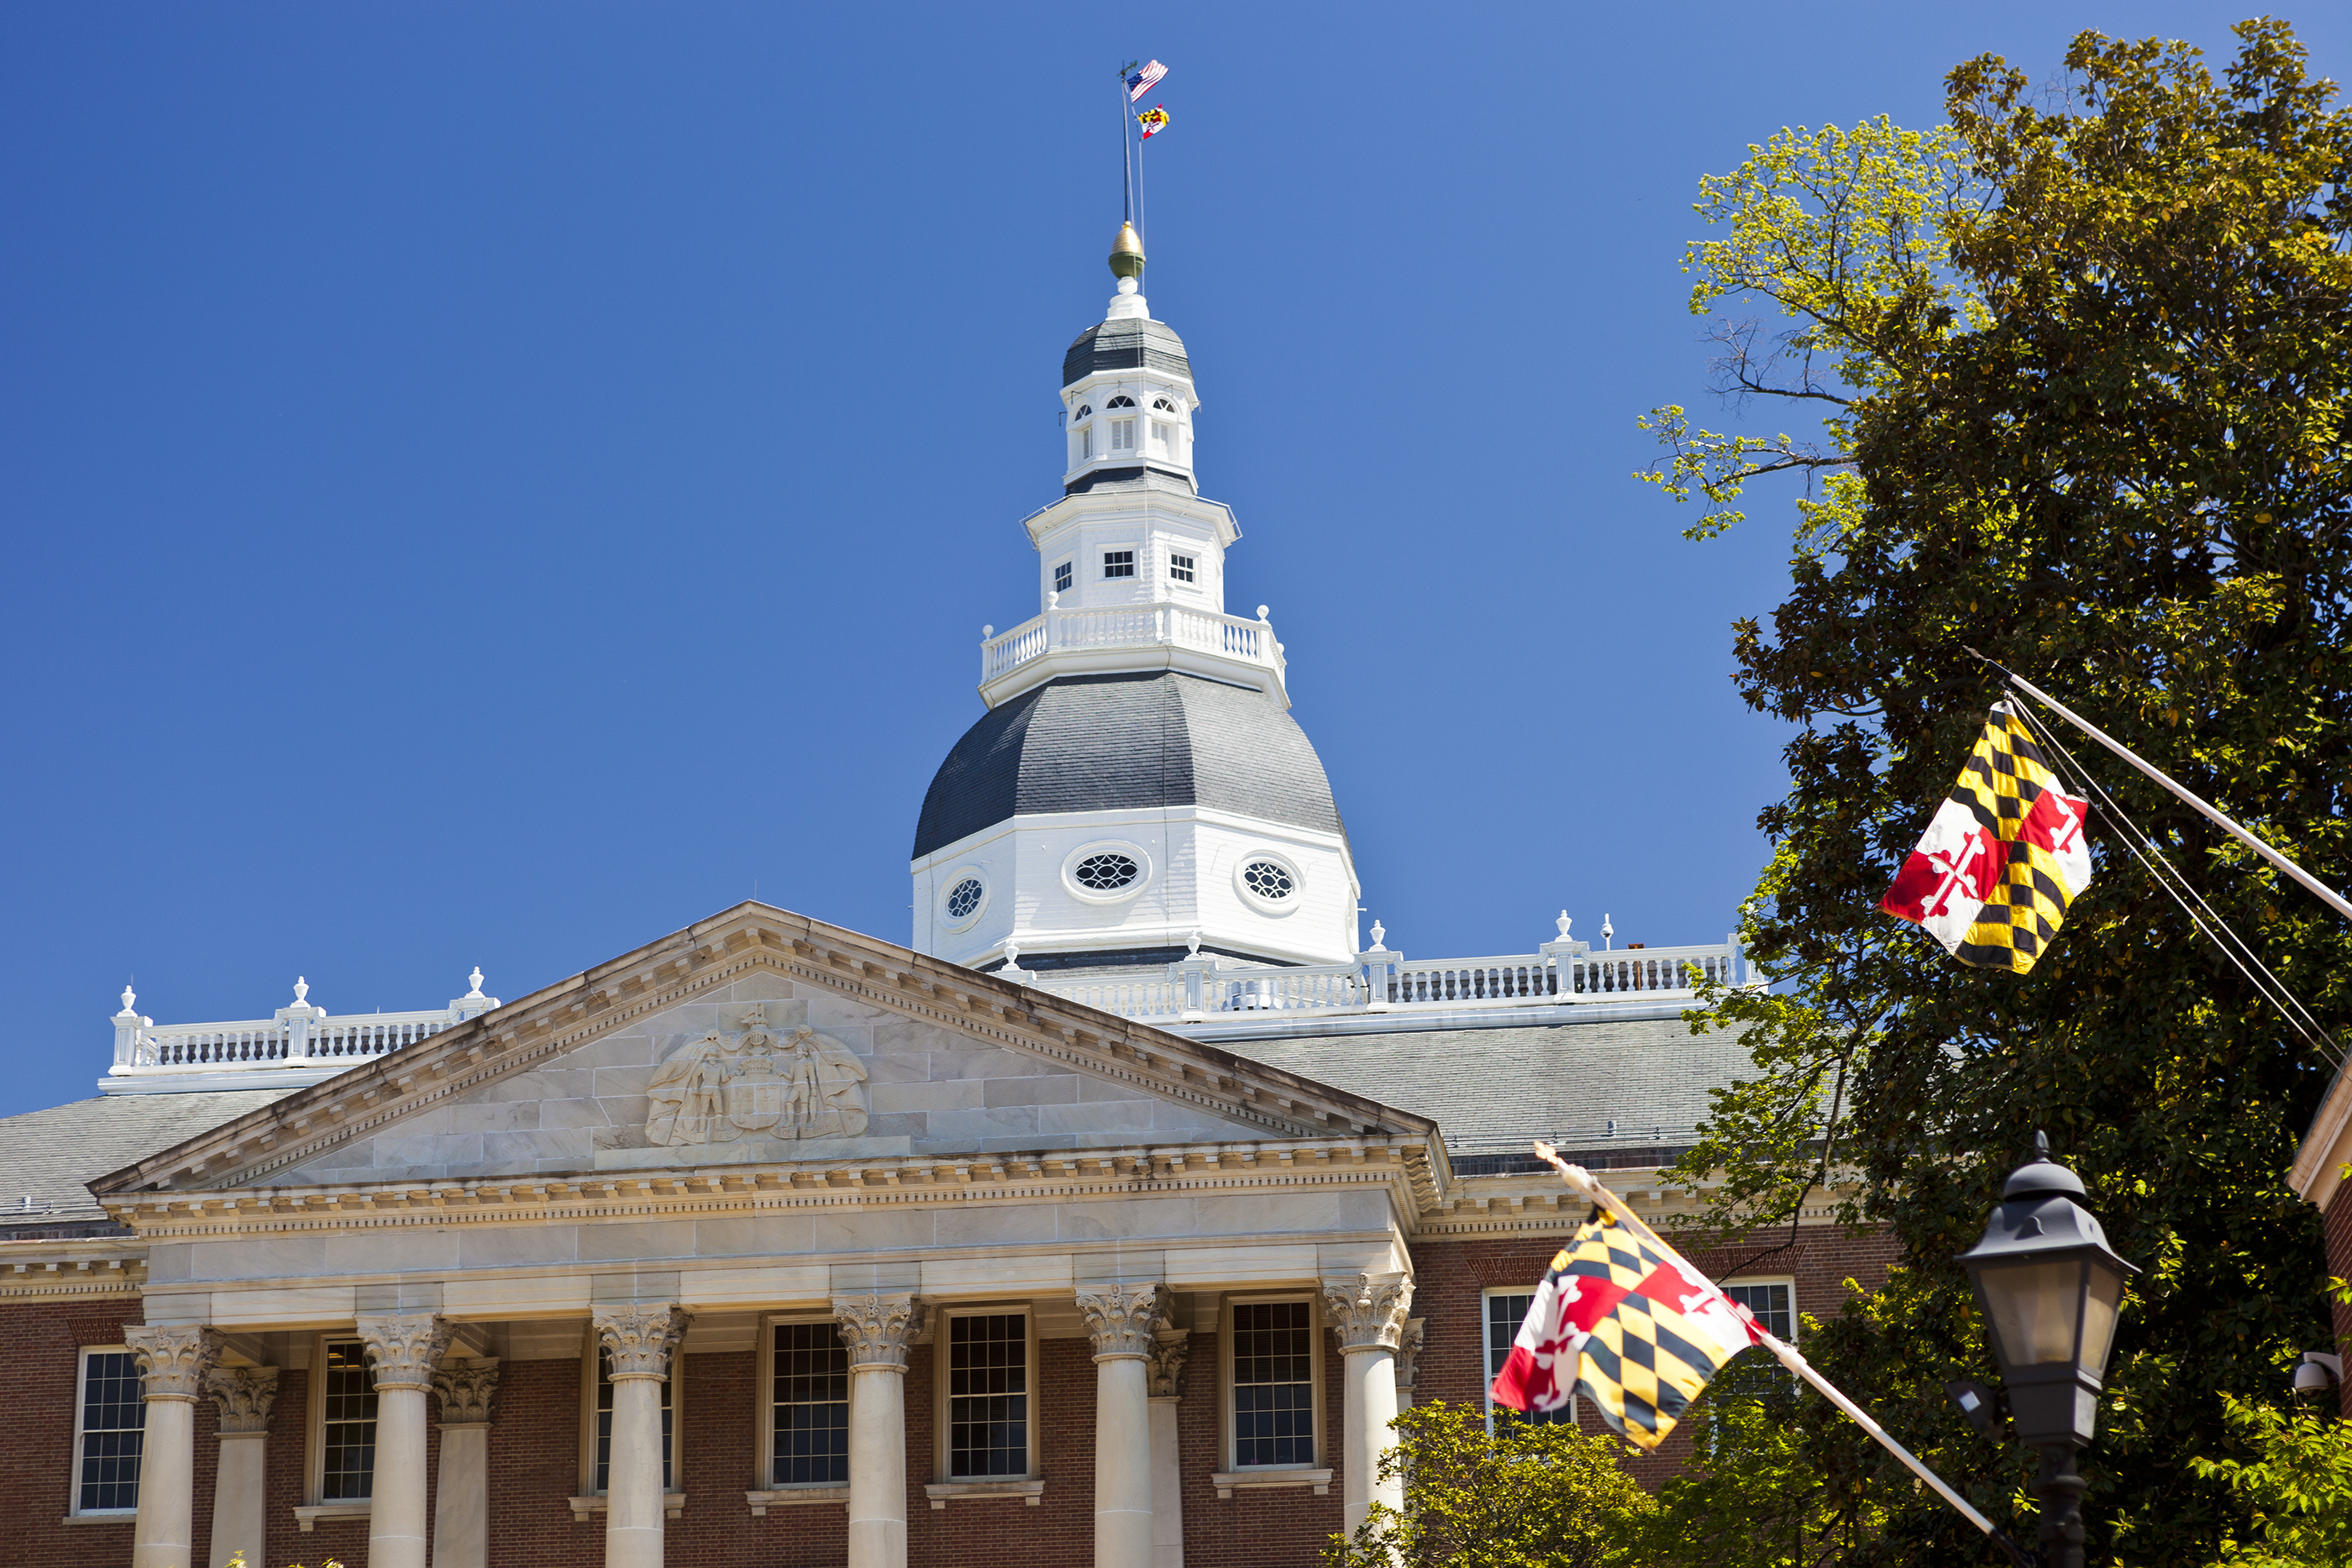 Maryland capital